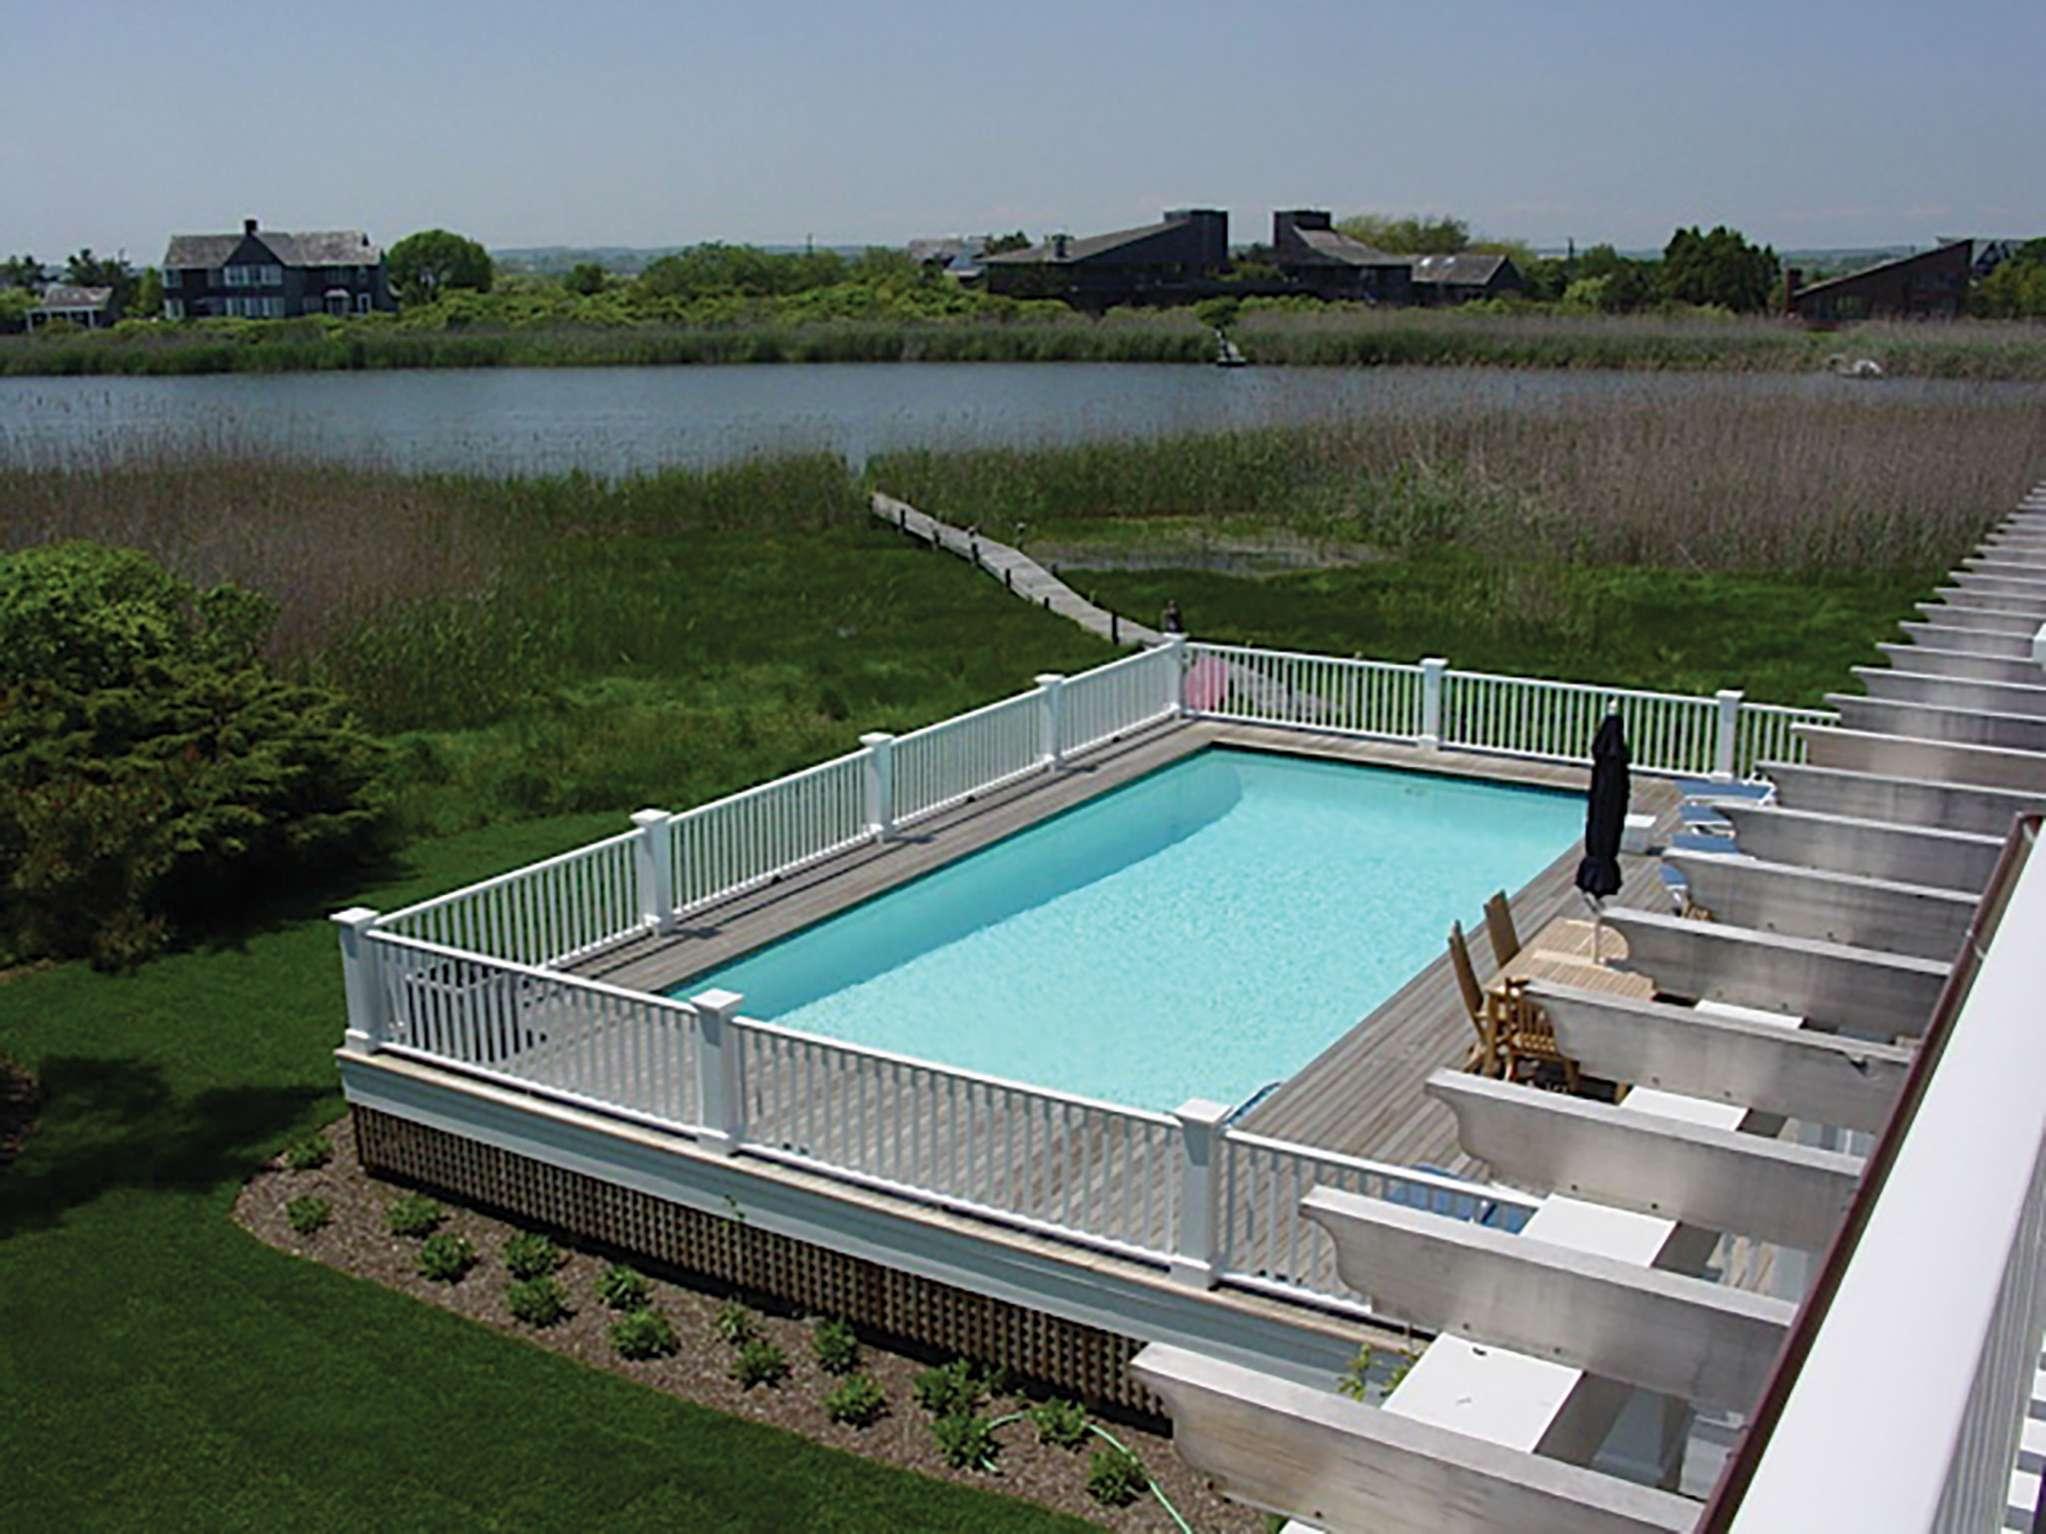 Additional photo for property listing at Bridgehampton Mecox Bayfront With Dock And Pool  Bridgehampton, Nueva York